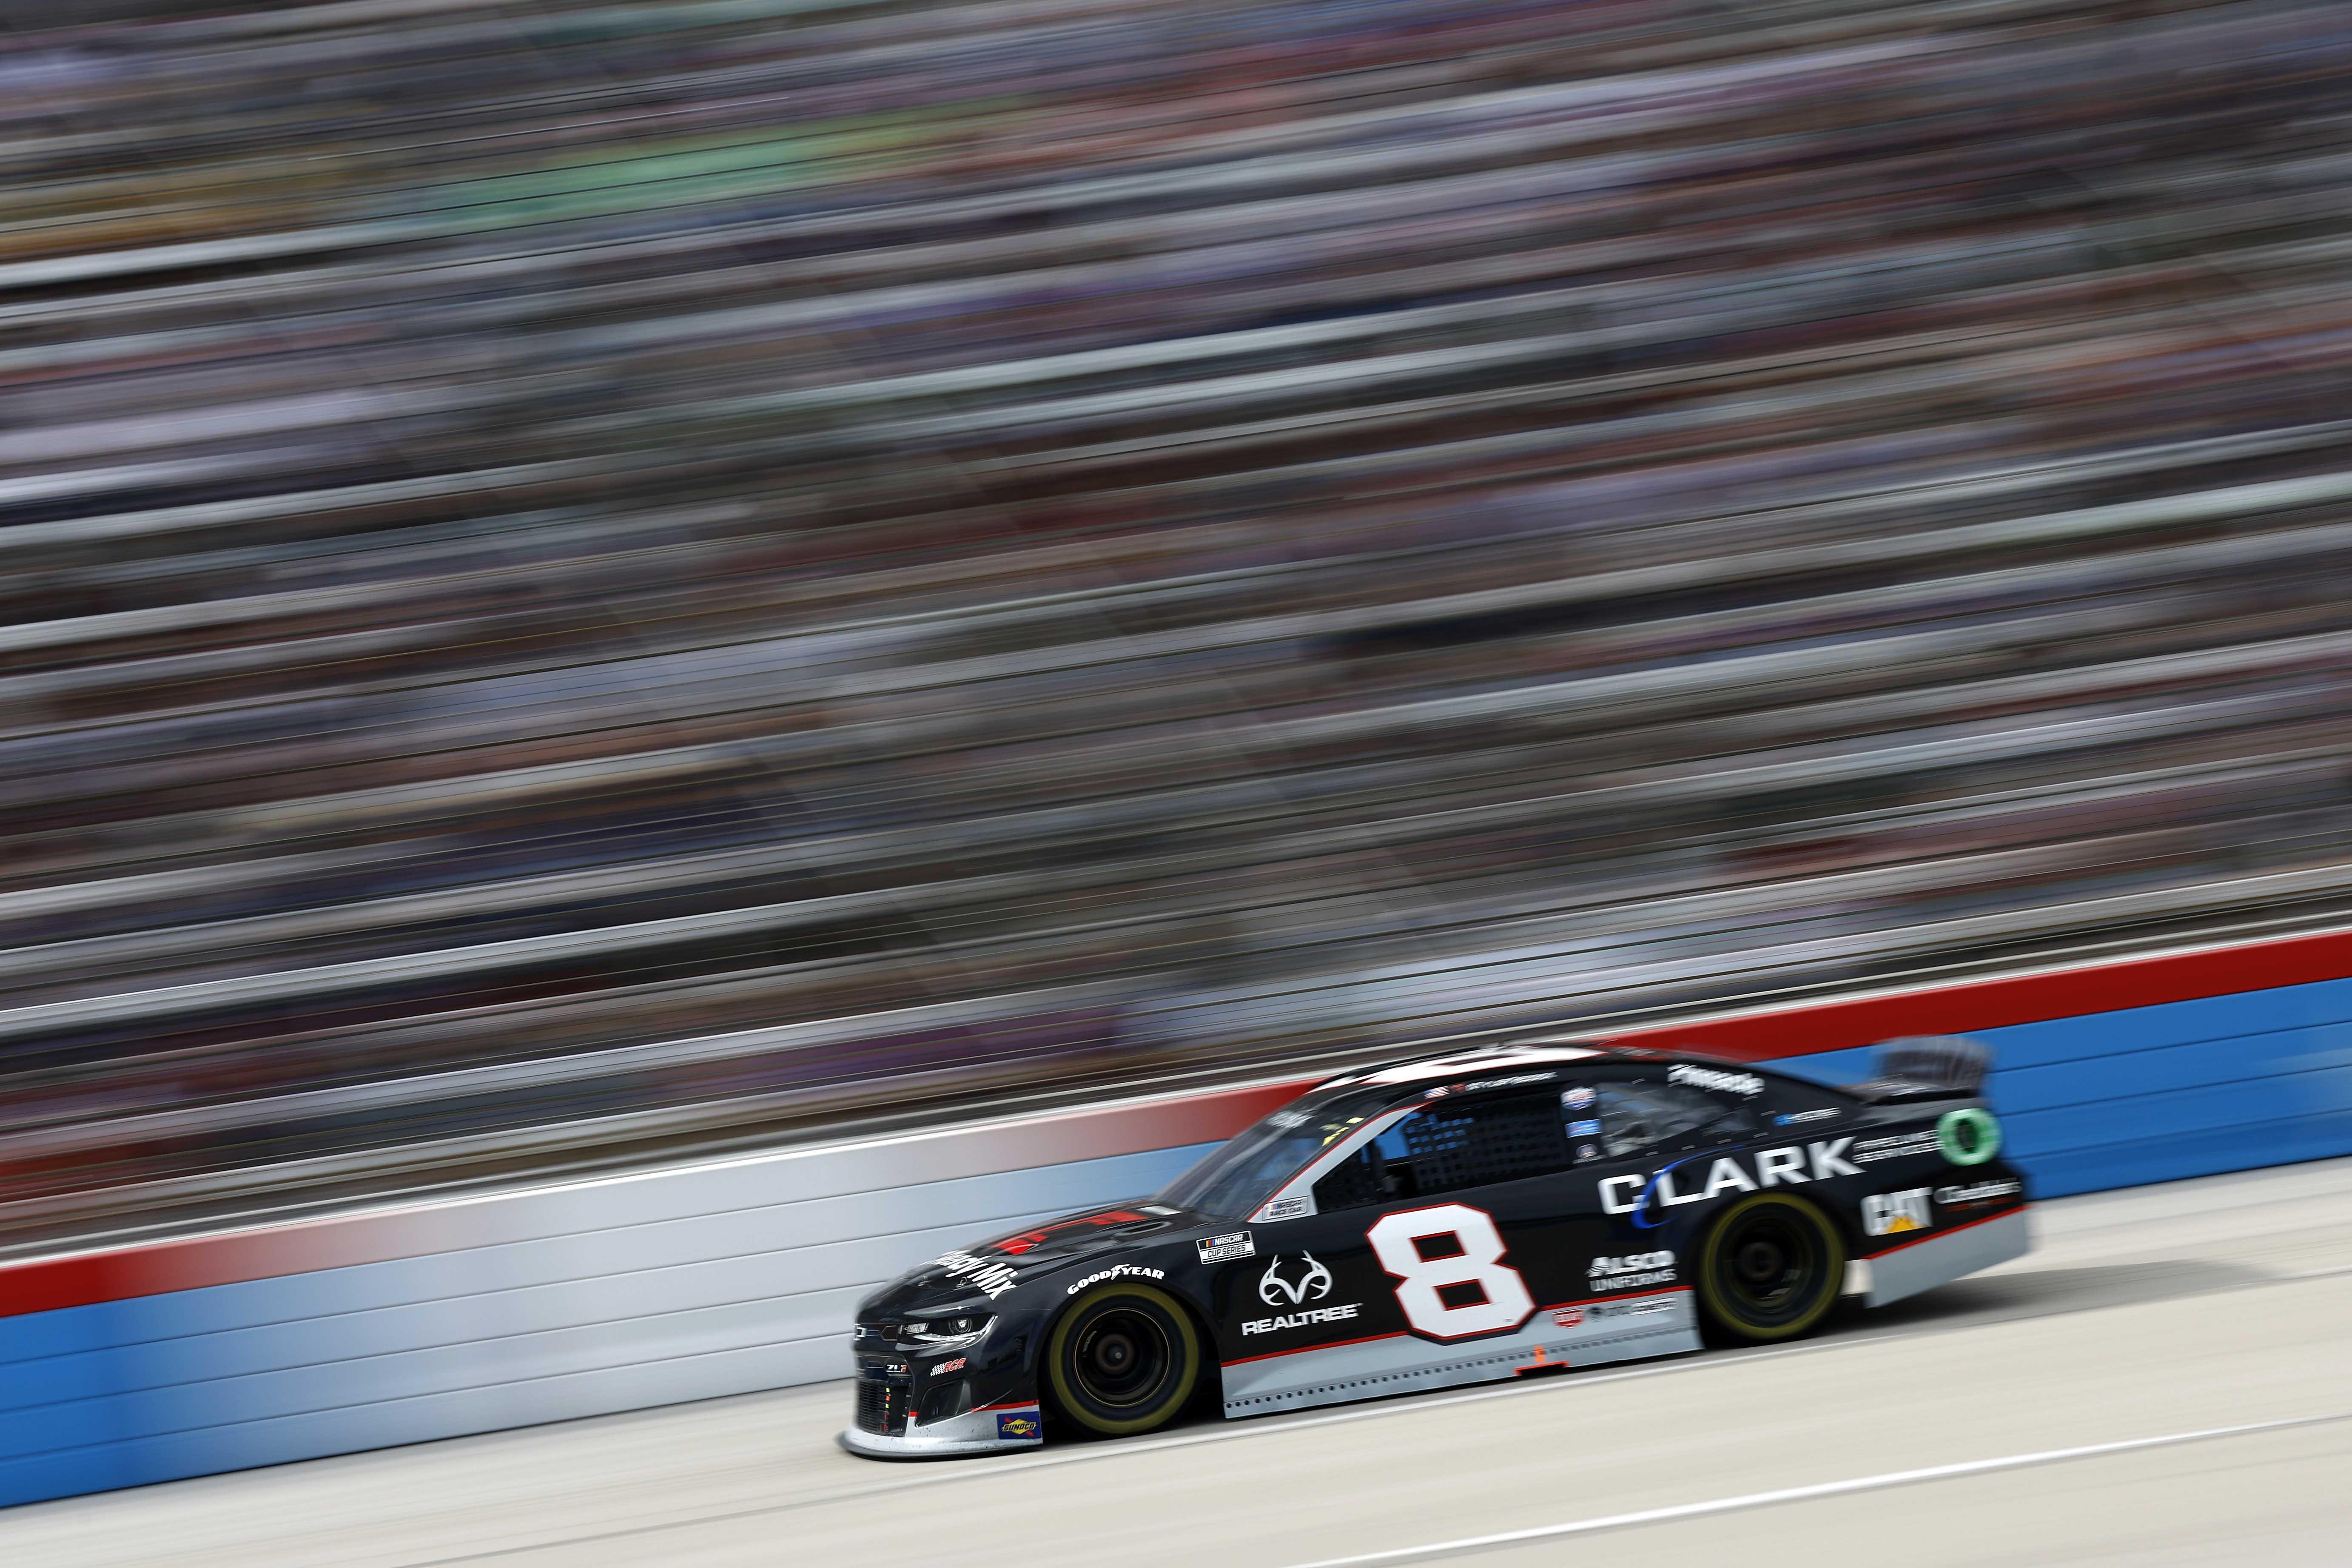 Tyler Reddick - Texas Motor Speedway - NASCAR Cup Series - Dale Earnhardt Throwback